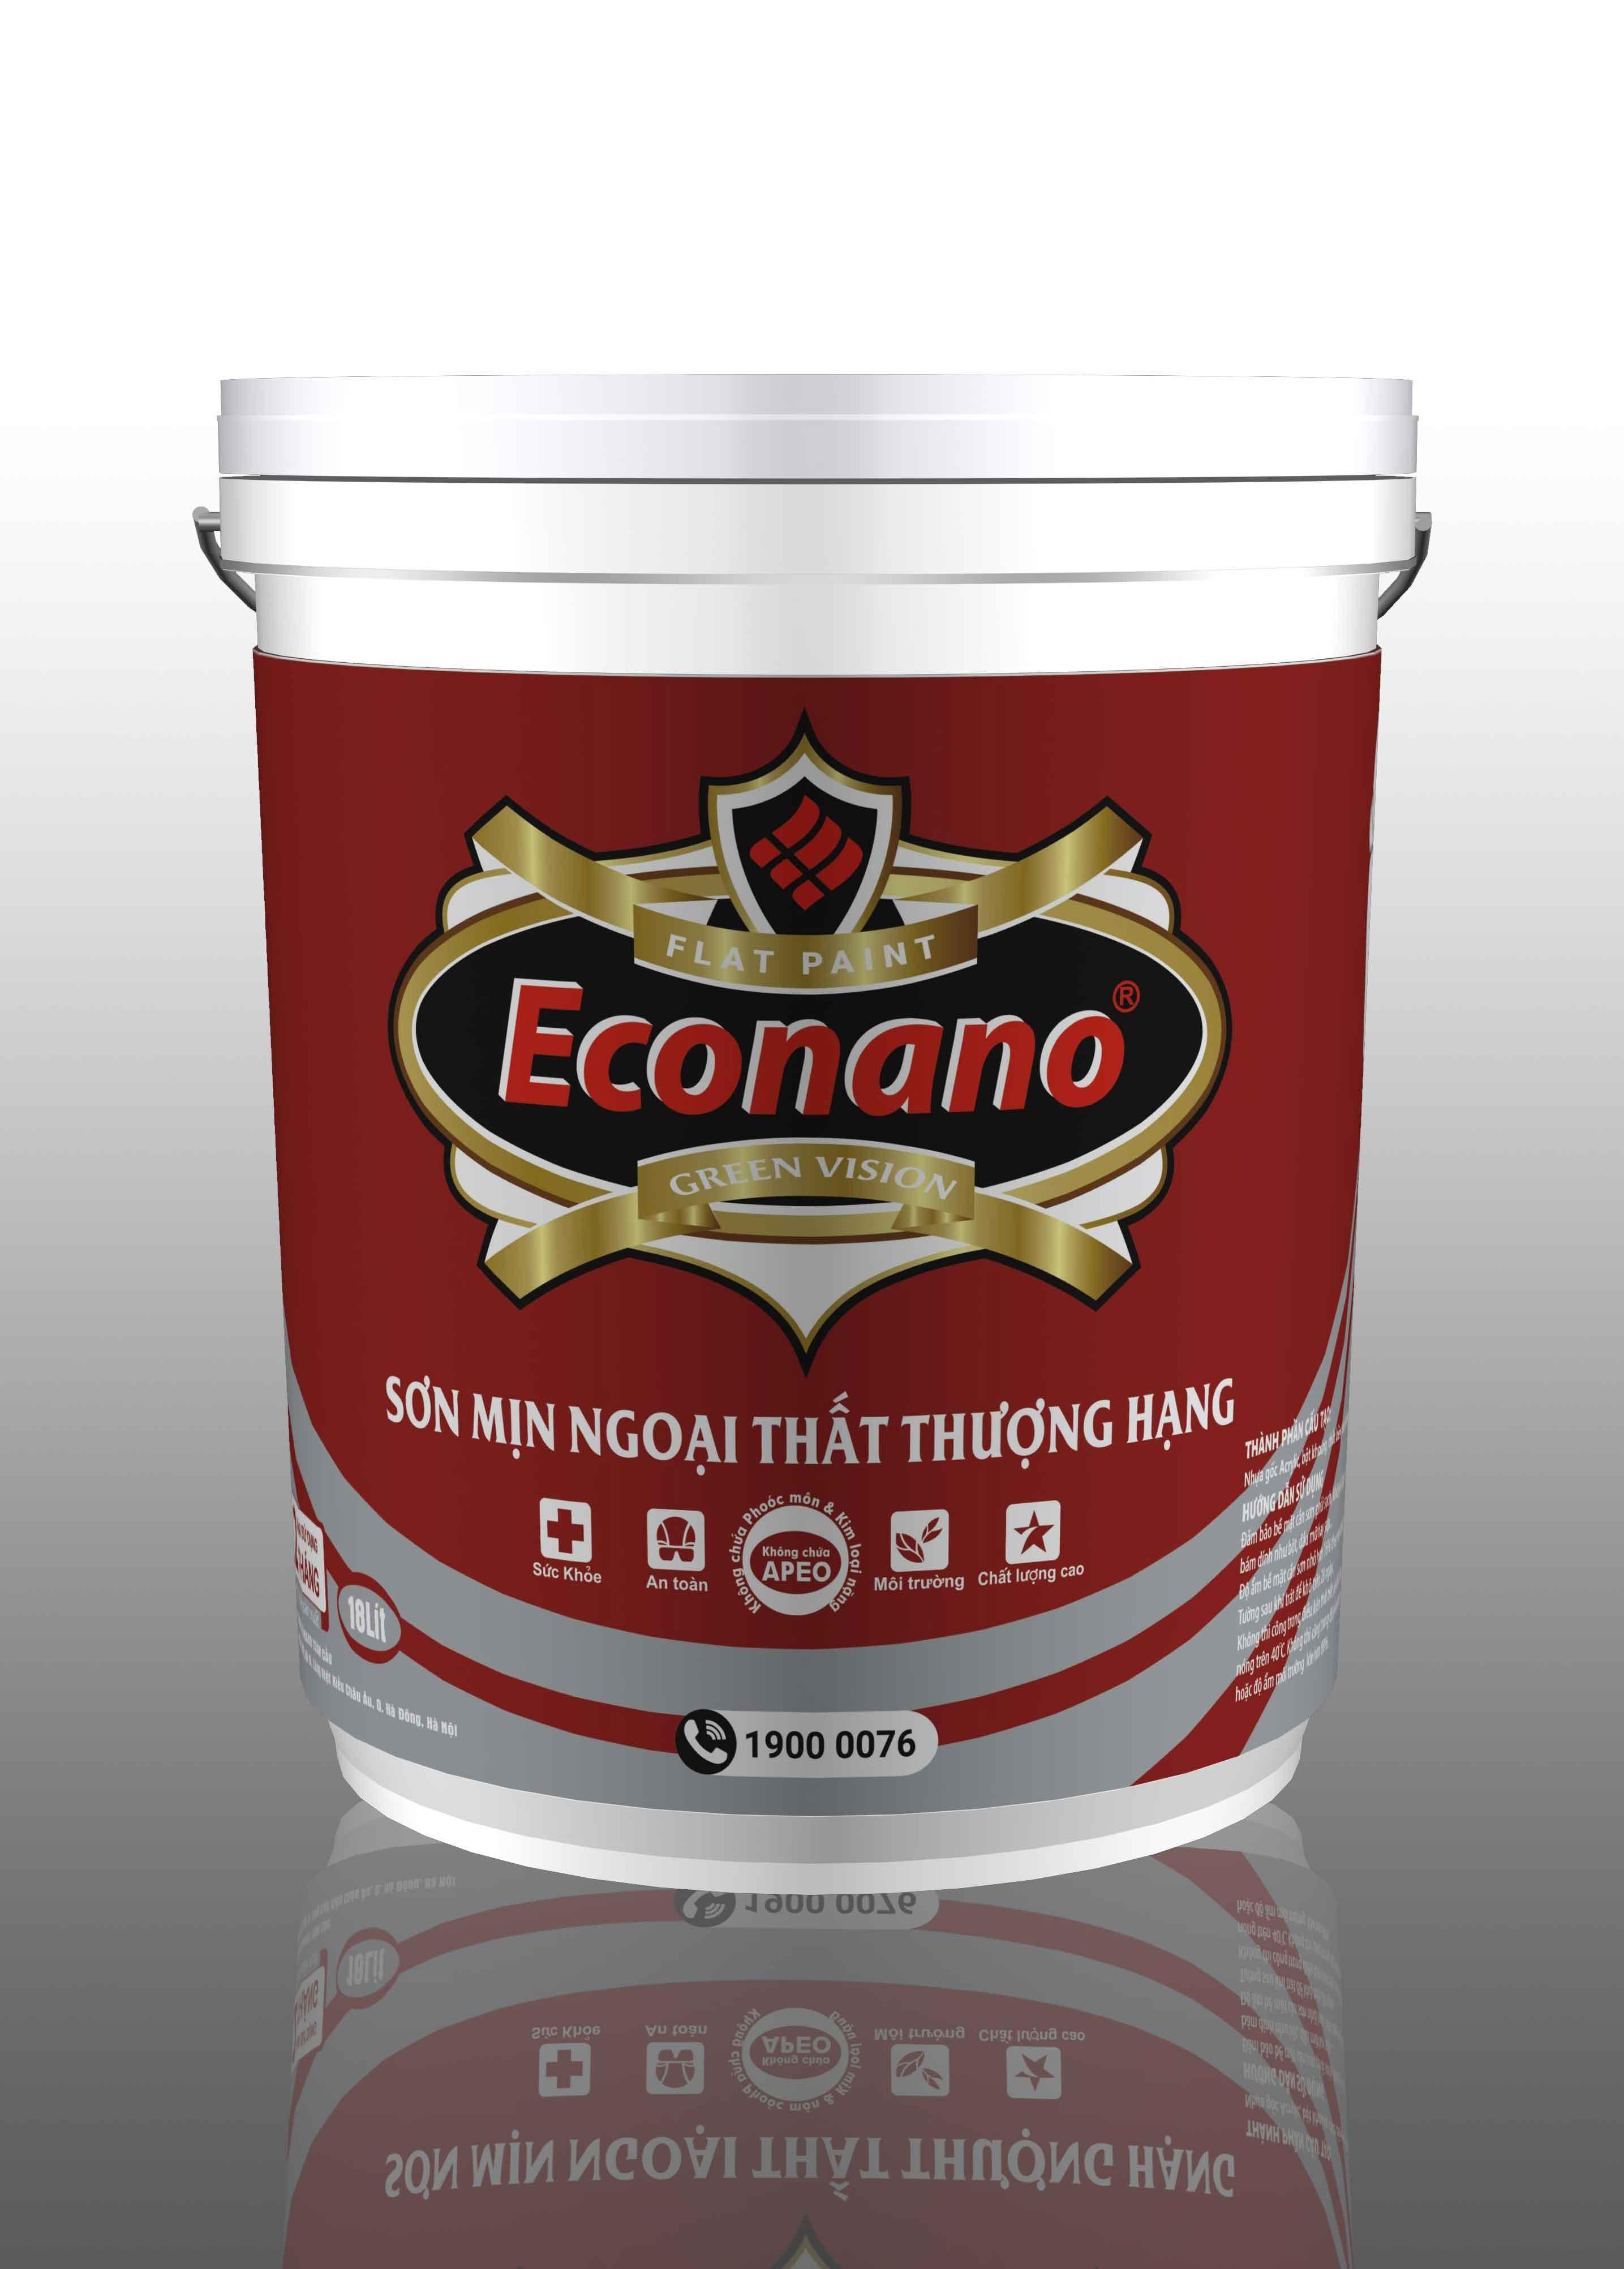 son-min-ngoai-that-thuong-hang-econano